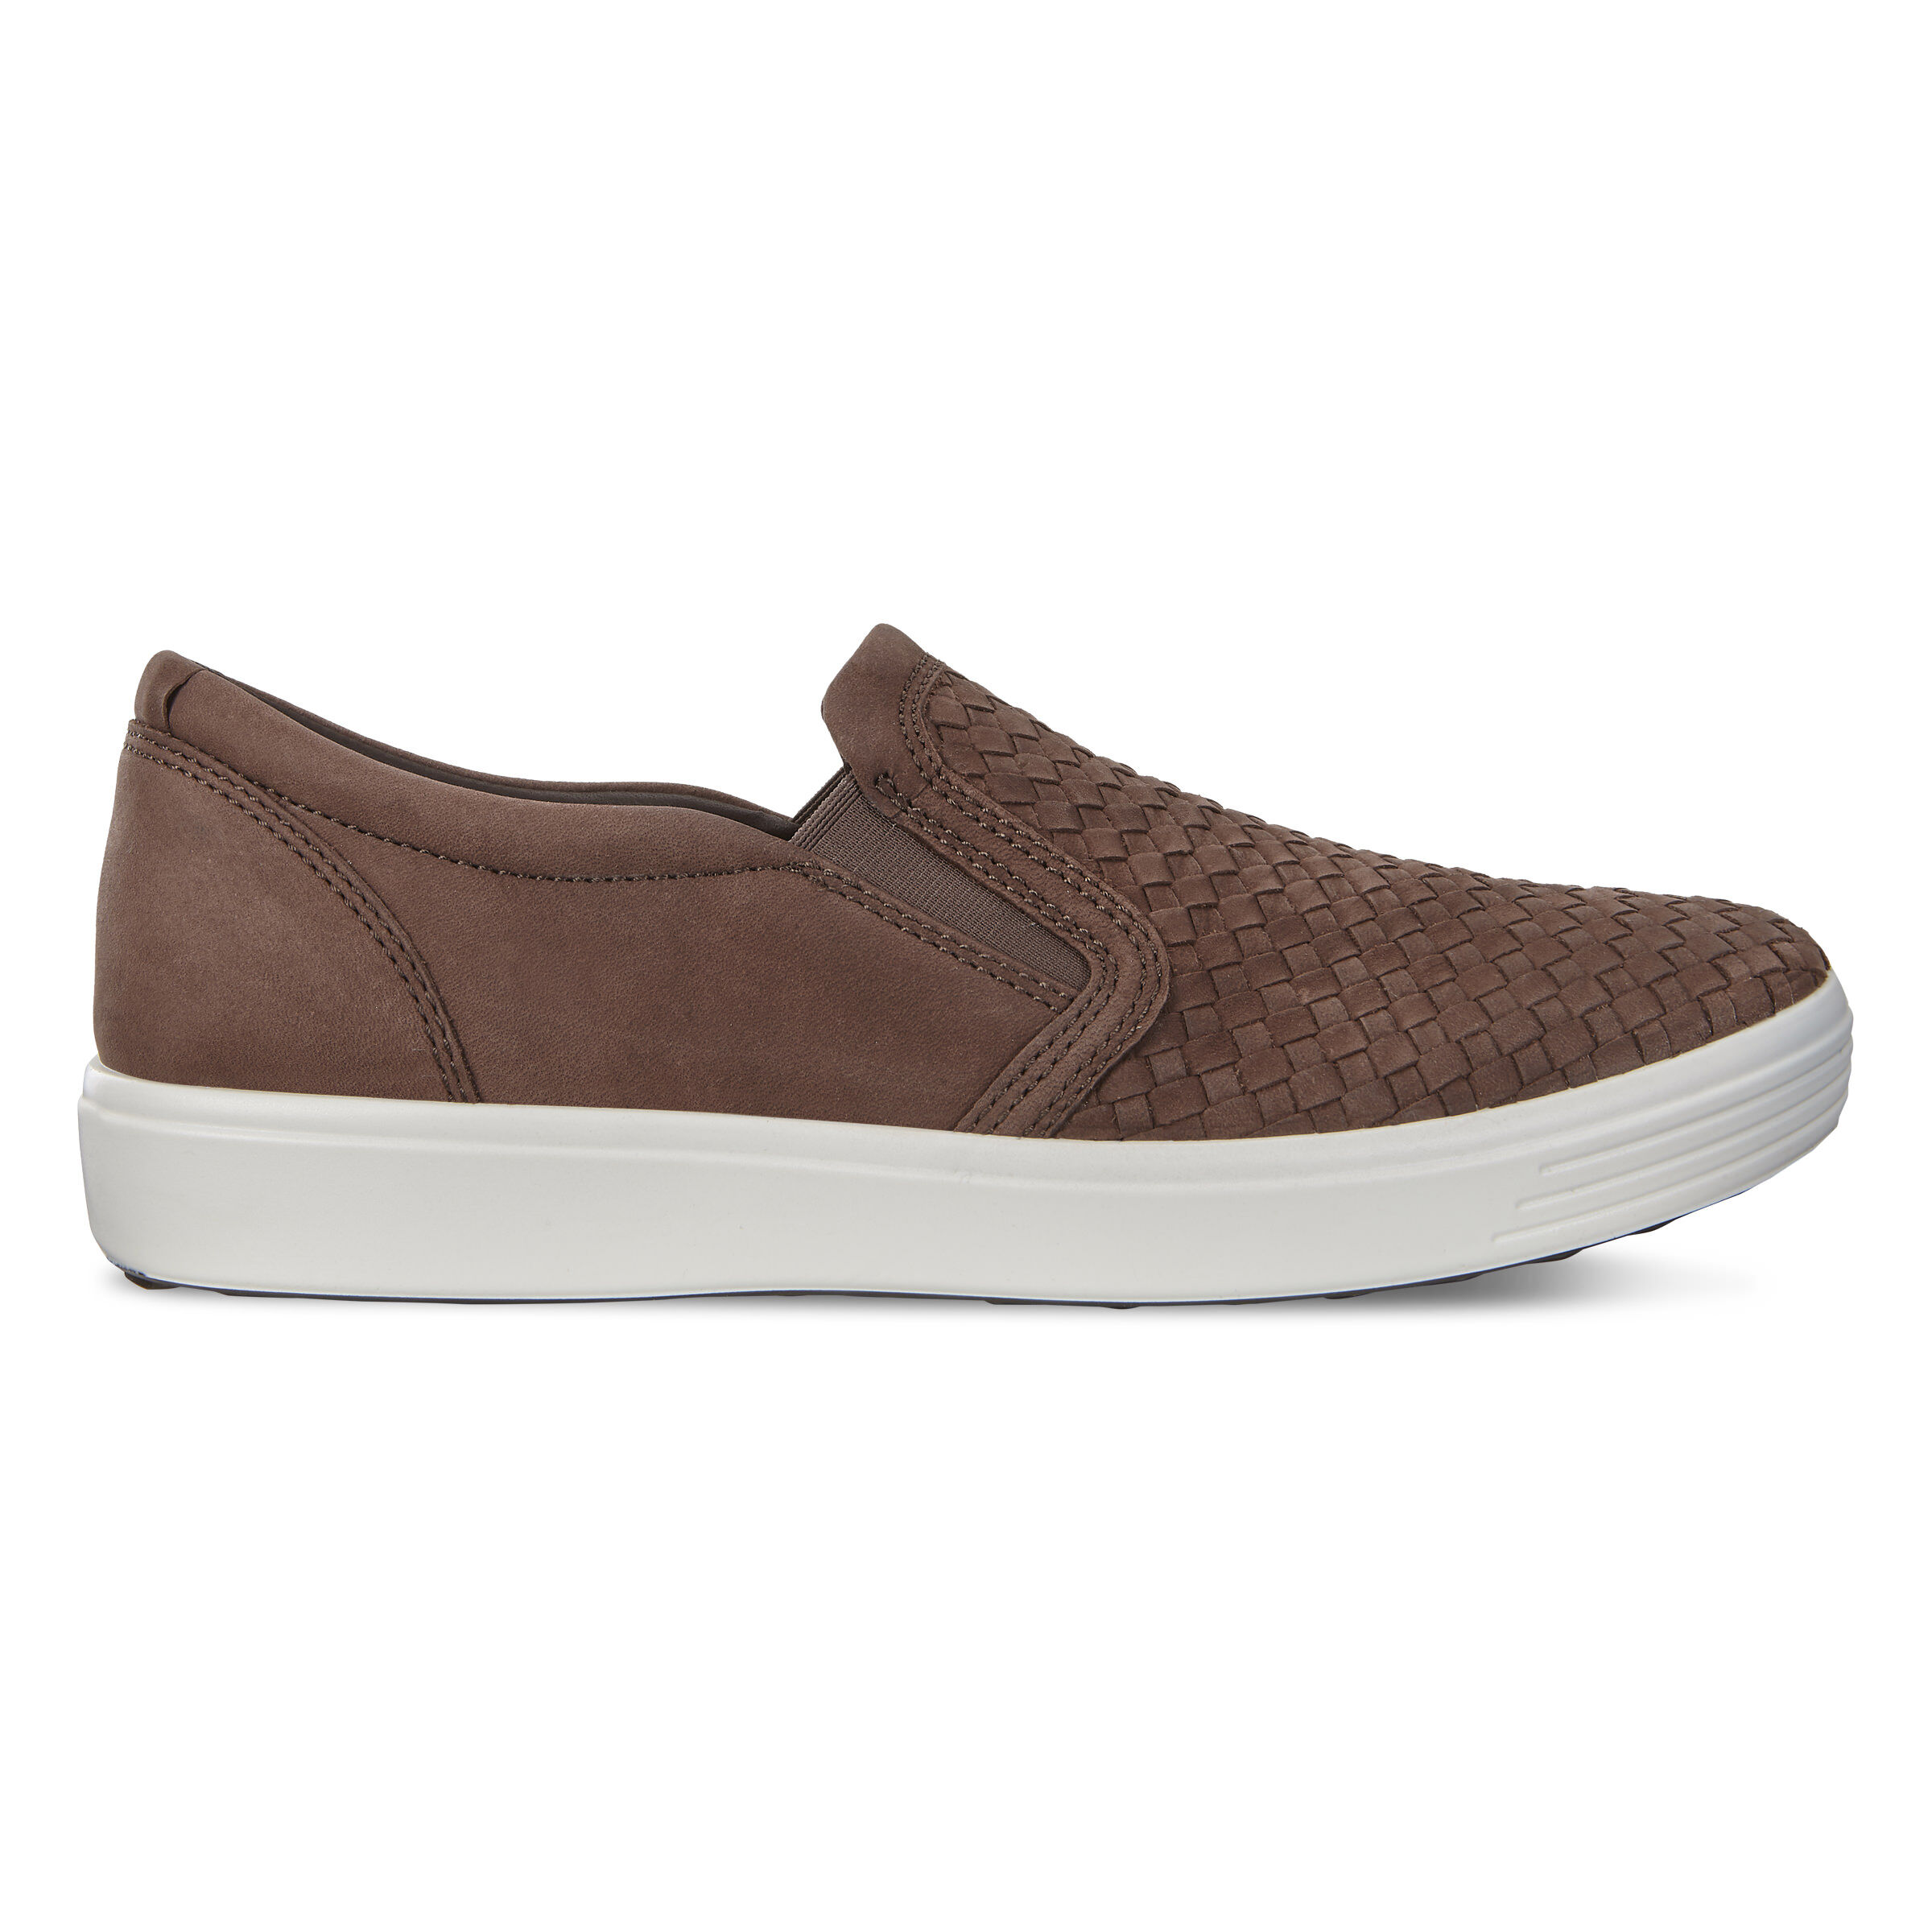 ECCO Soft 7 Mens Slip-on Shoes